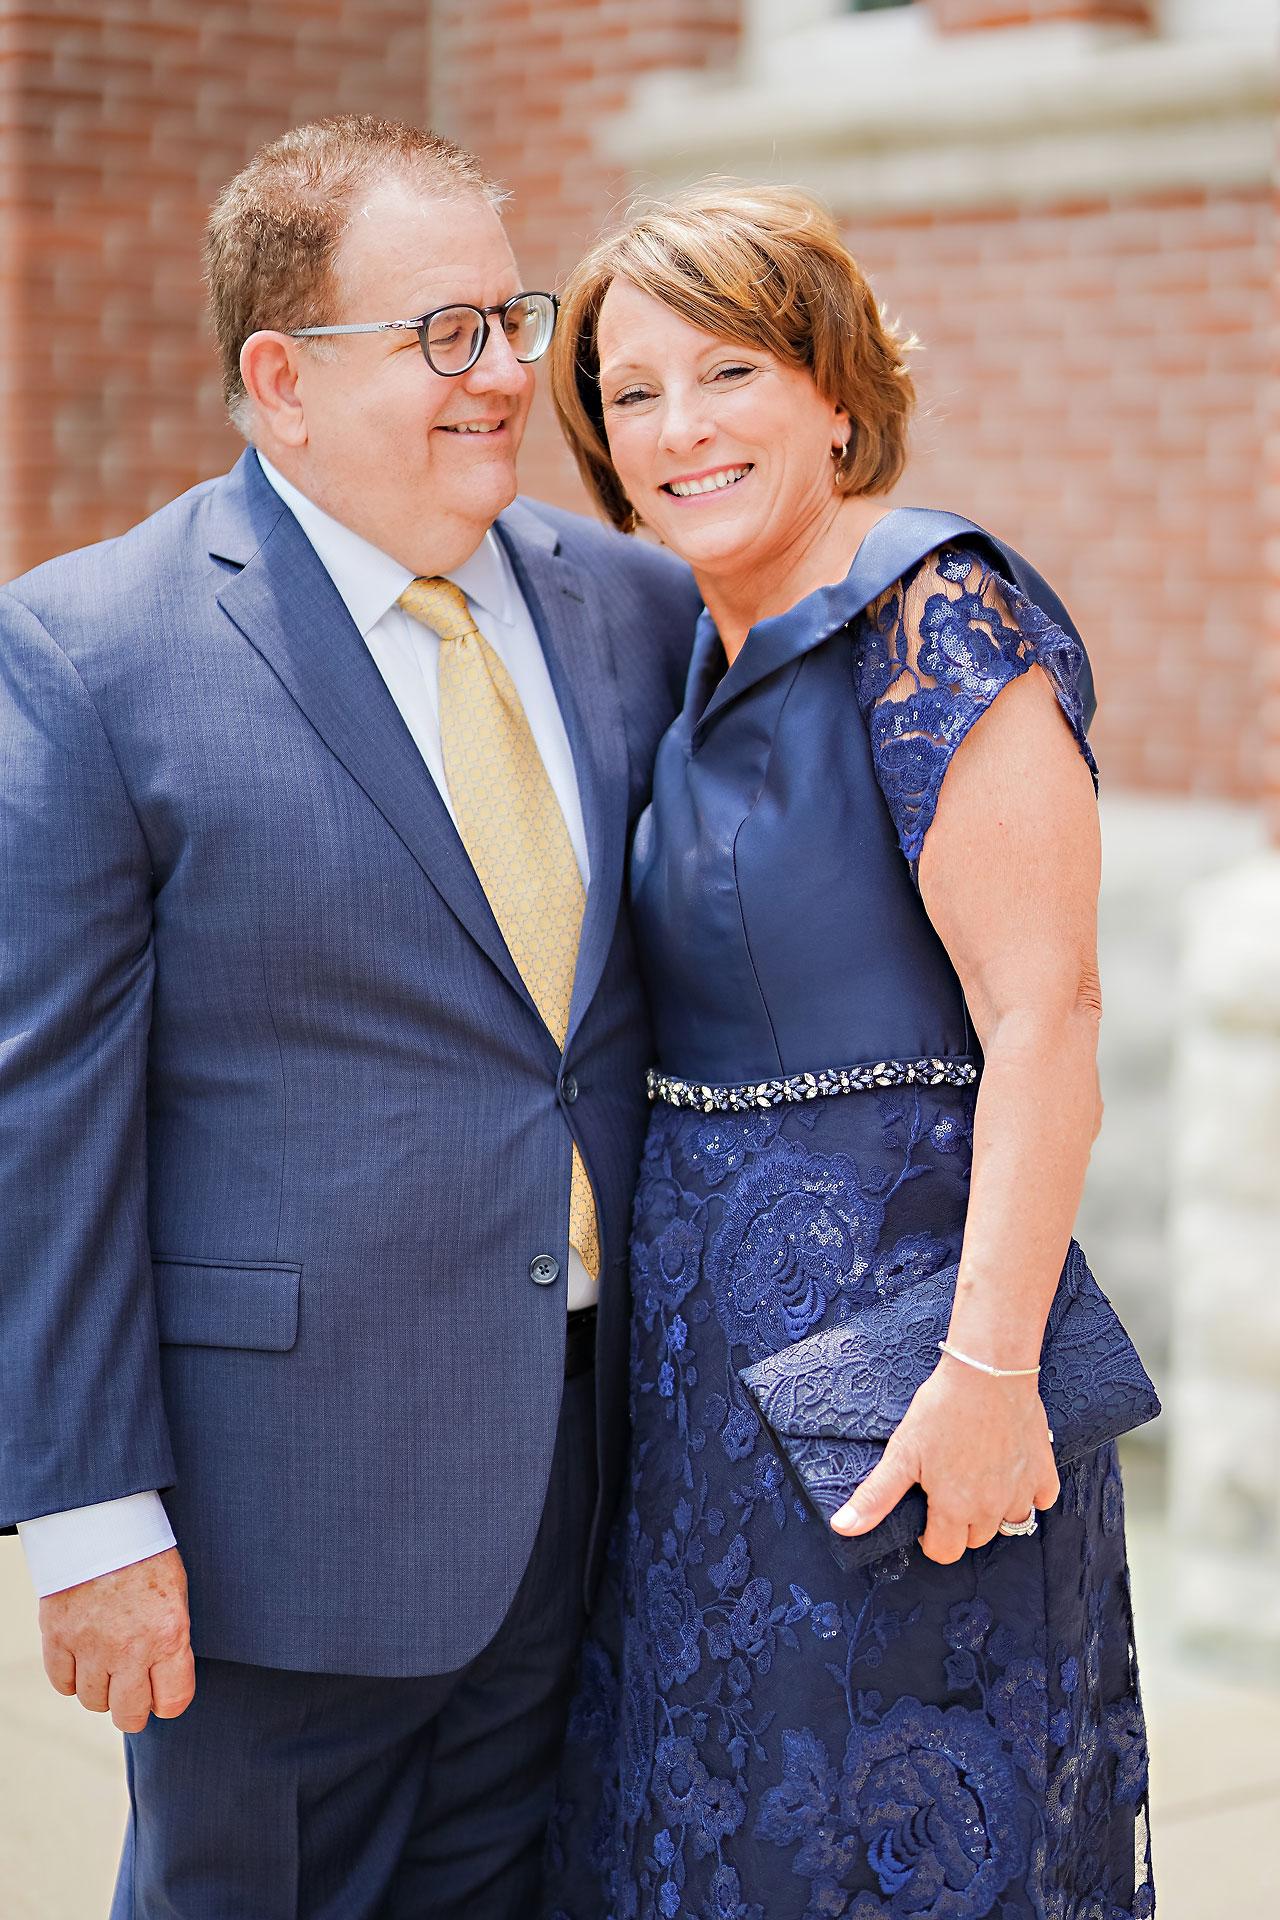 Sammi Jack Regions Tower JPS Events Indianapolis Wedding 129